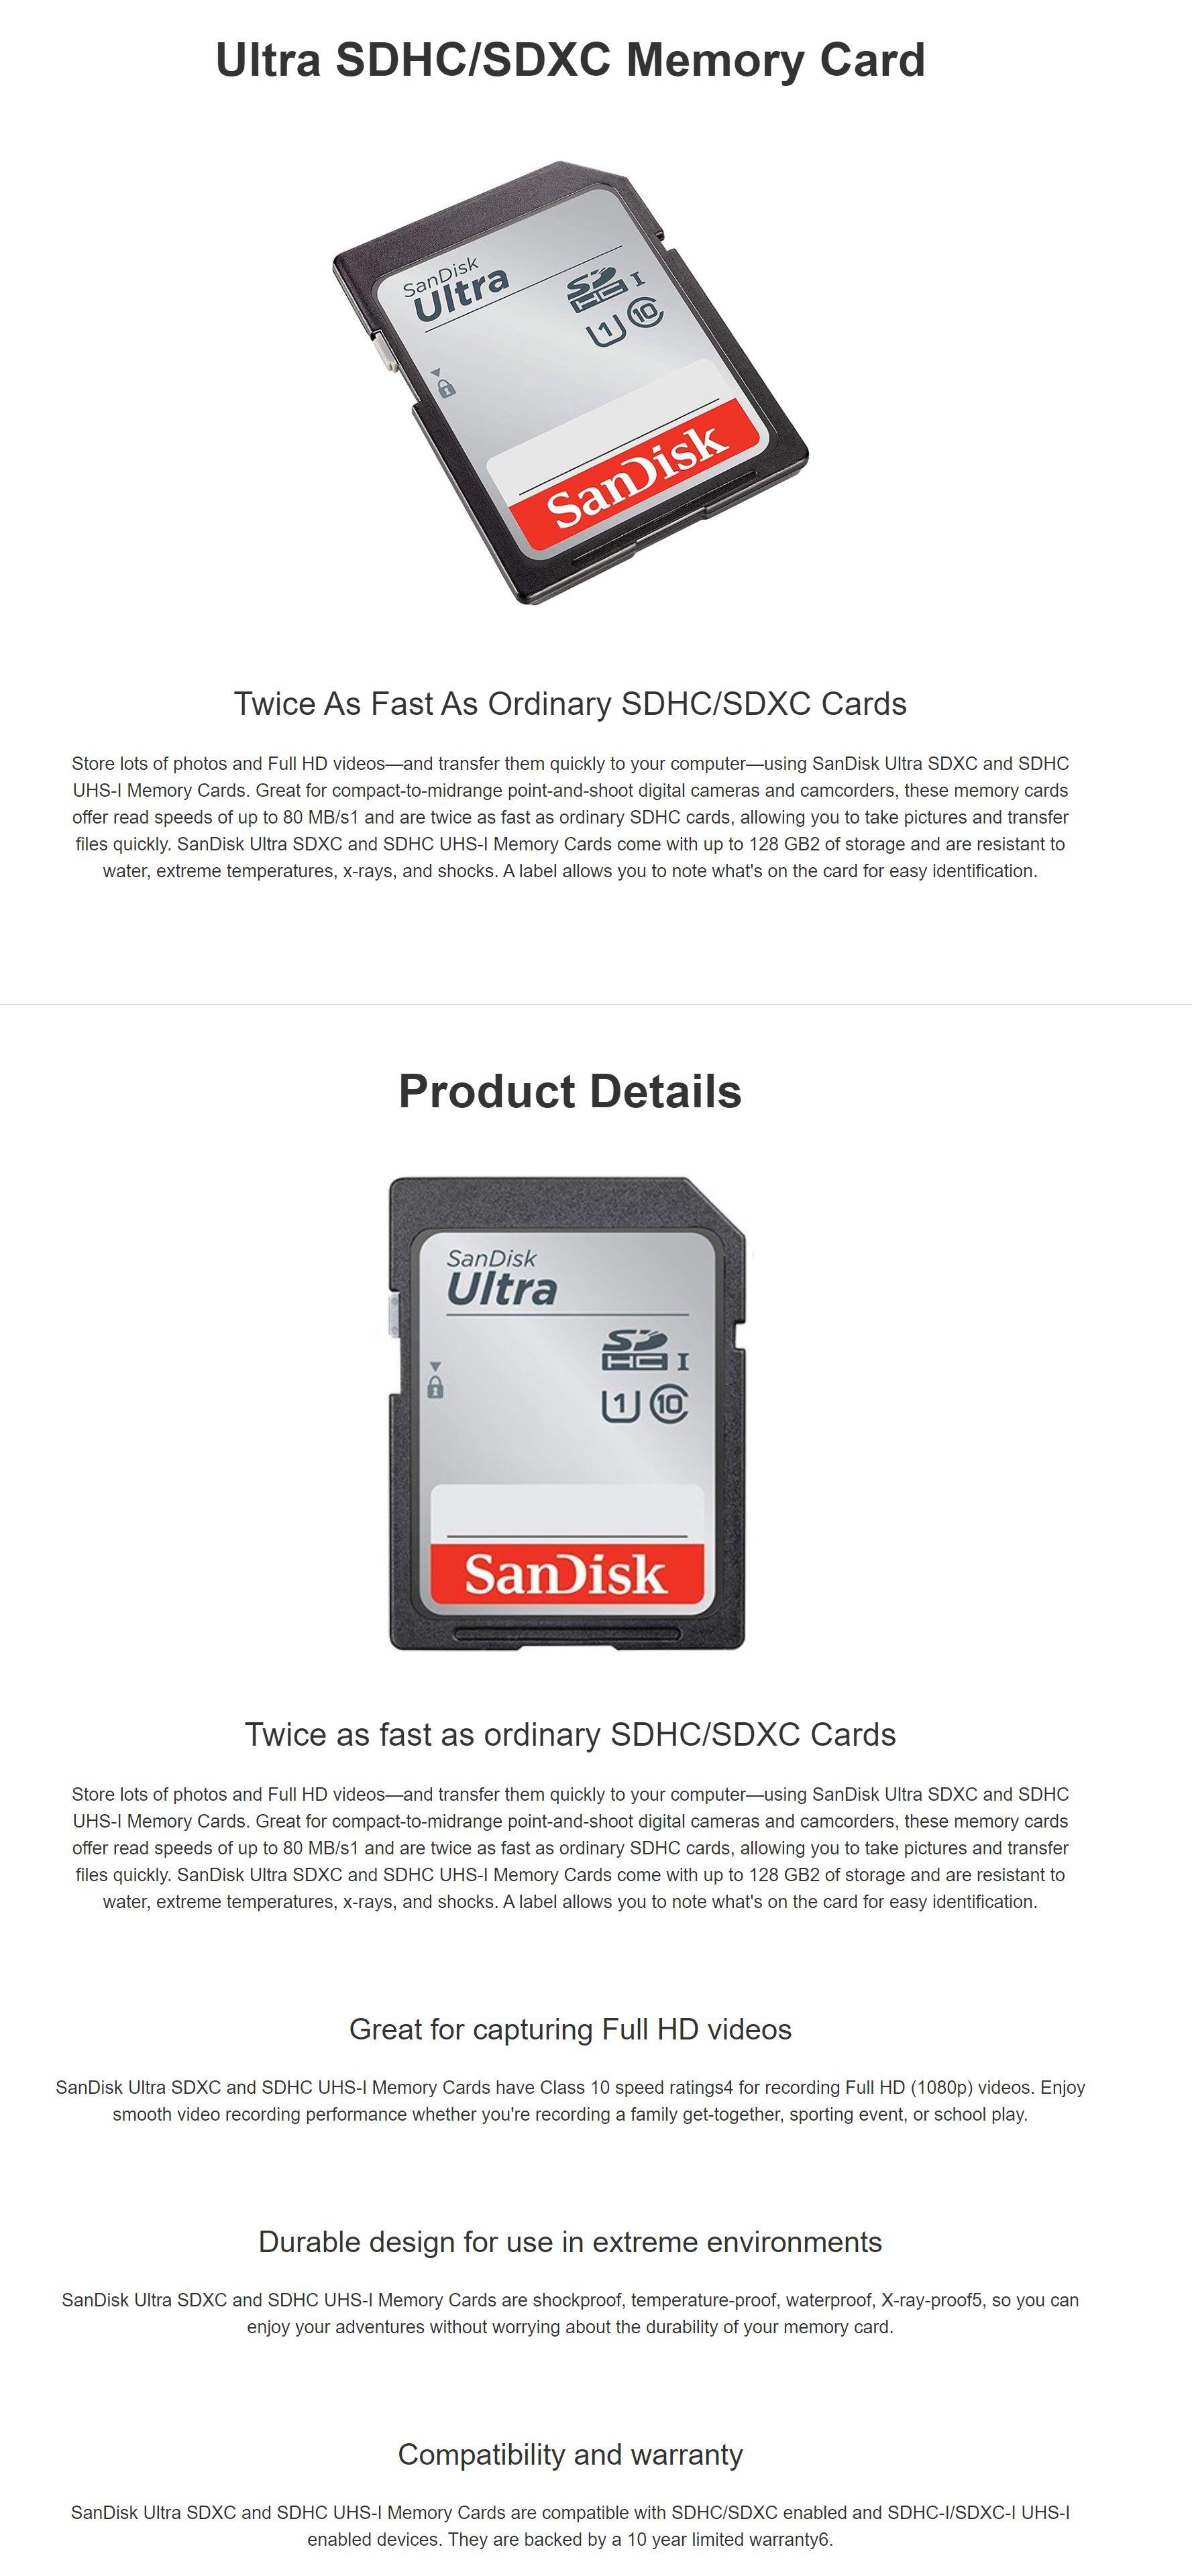 #1830 - 'SanDisk Ultra 32GB SDHC Class 10 U1 Memory Card - 90MB_s - SDSDUNR-032G I Mwave_com_au' - www_mwave_com_au.jpg